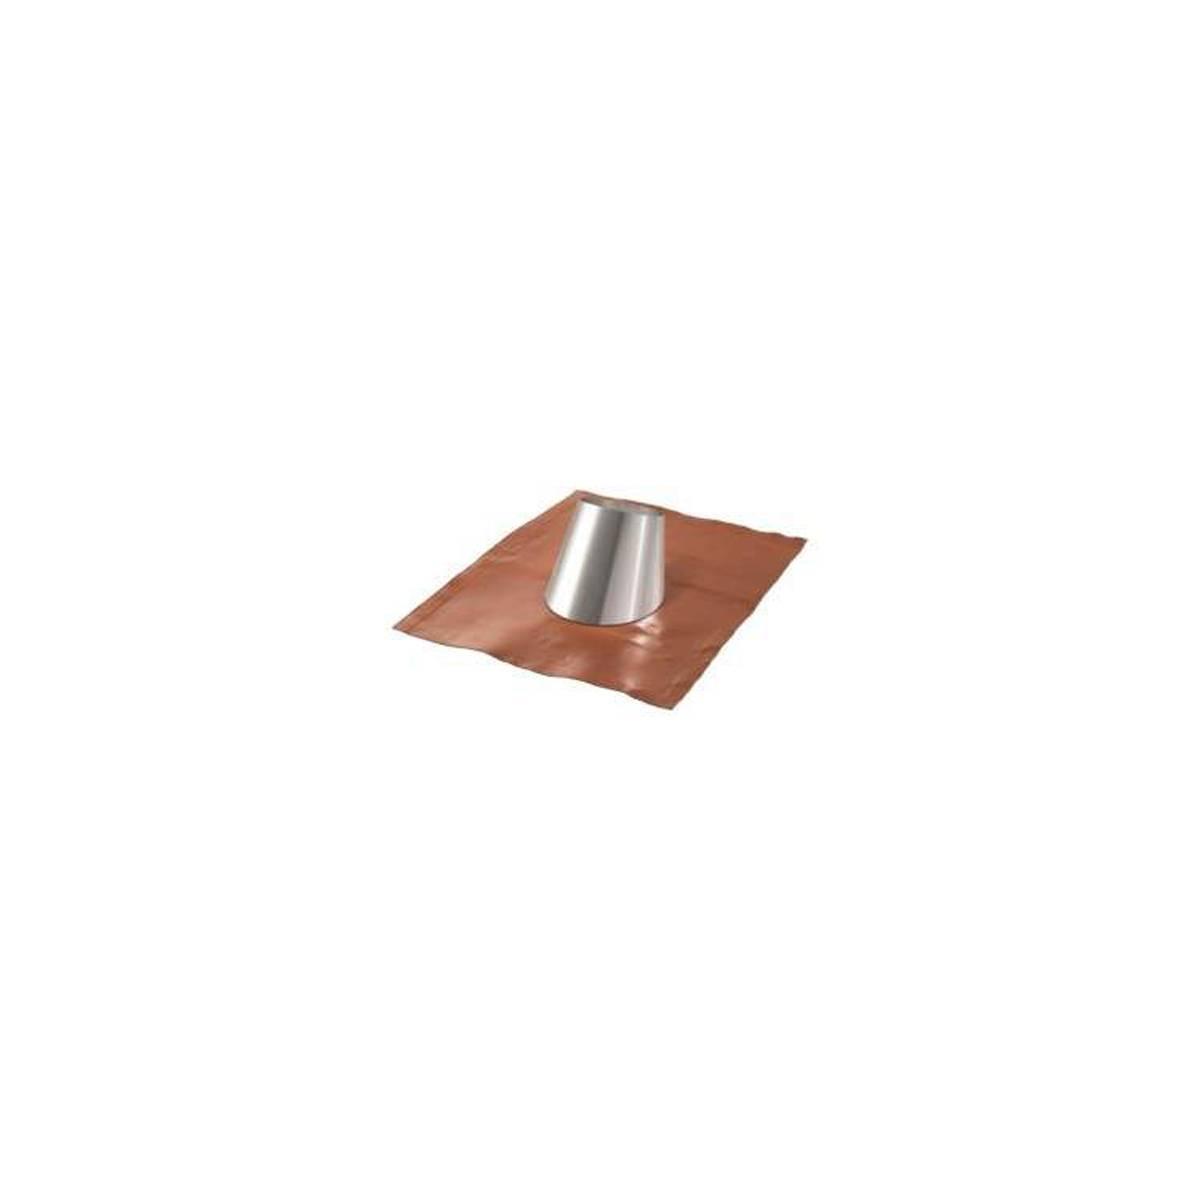 APROS Dynamic One - Faldale inox ø130 per tetti inclinati 33-45° base in gomma